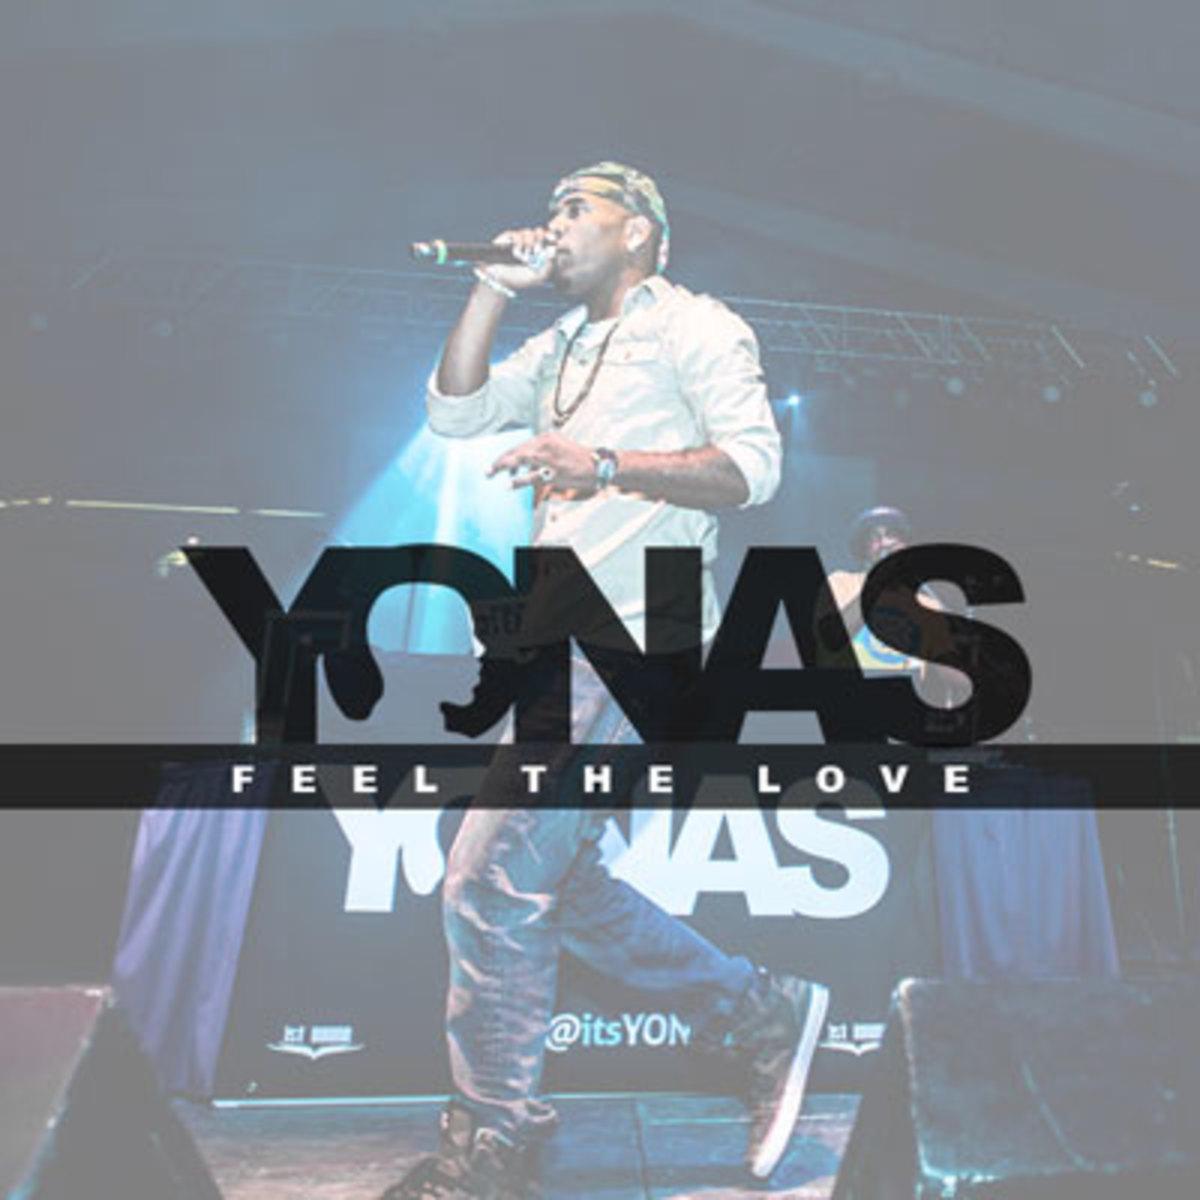 yonas-feelthelove.jpg